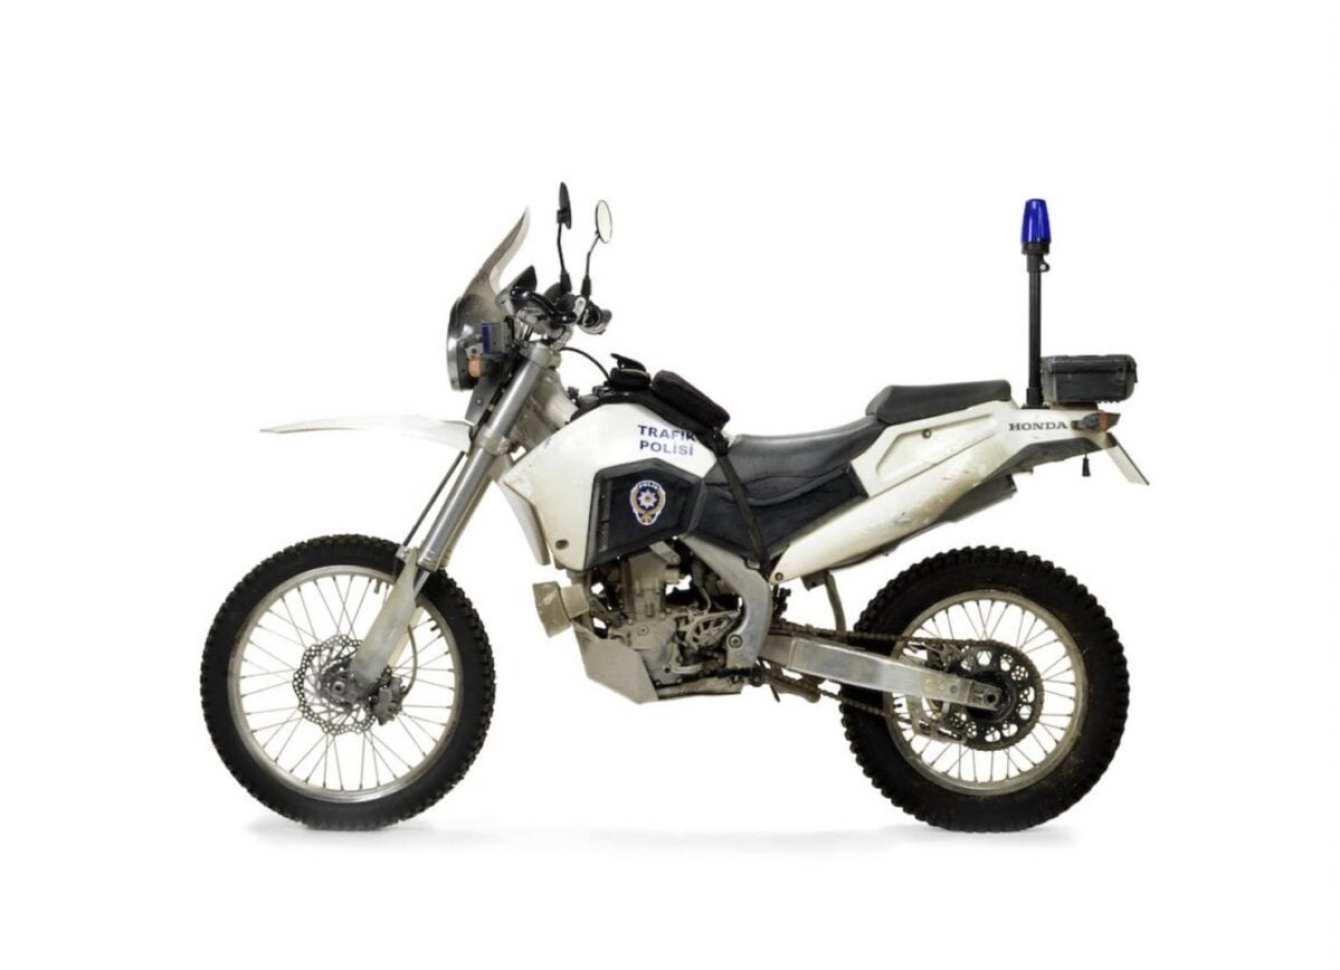 Honda-CRF250R-Motorcycle-Skyfall-James-Bond-2-1480x1071